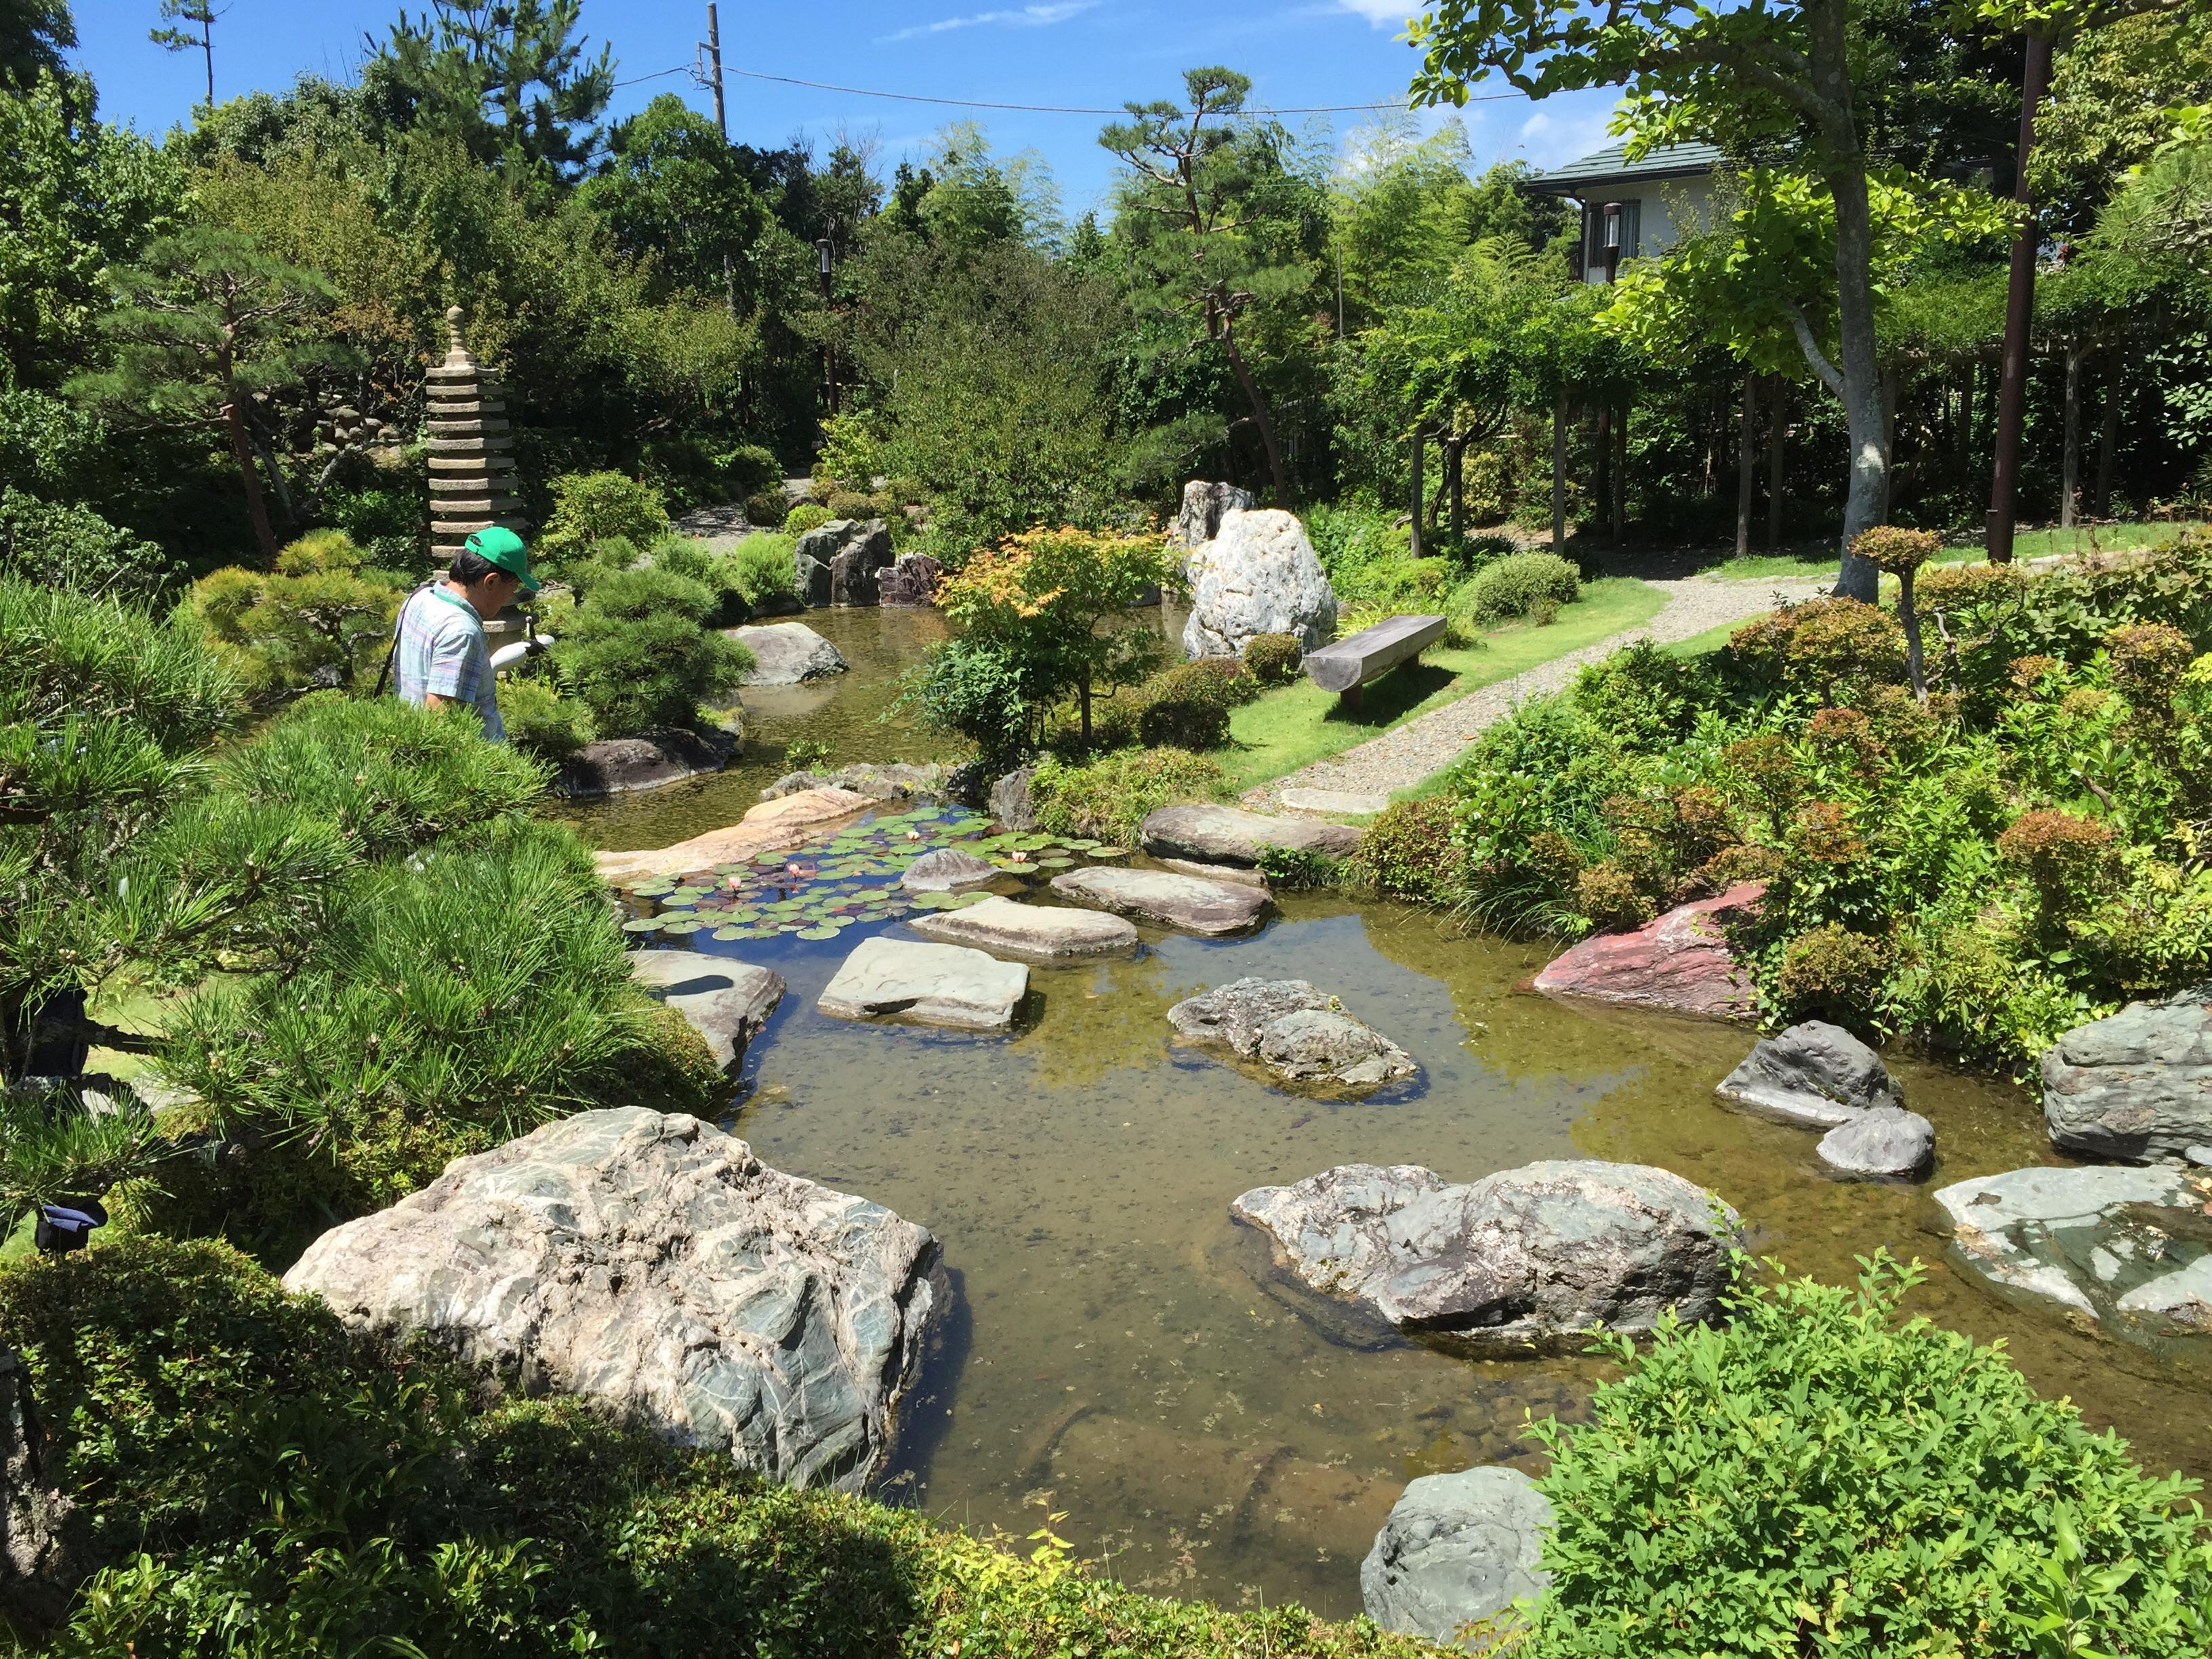 http://www.shonan-ls.co.jp/blog/landscape/img/yoshida1.jpg